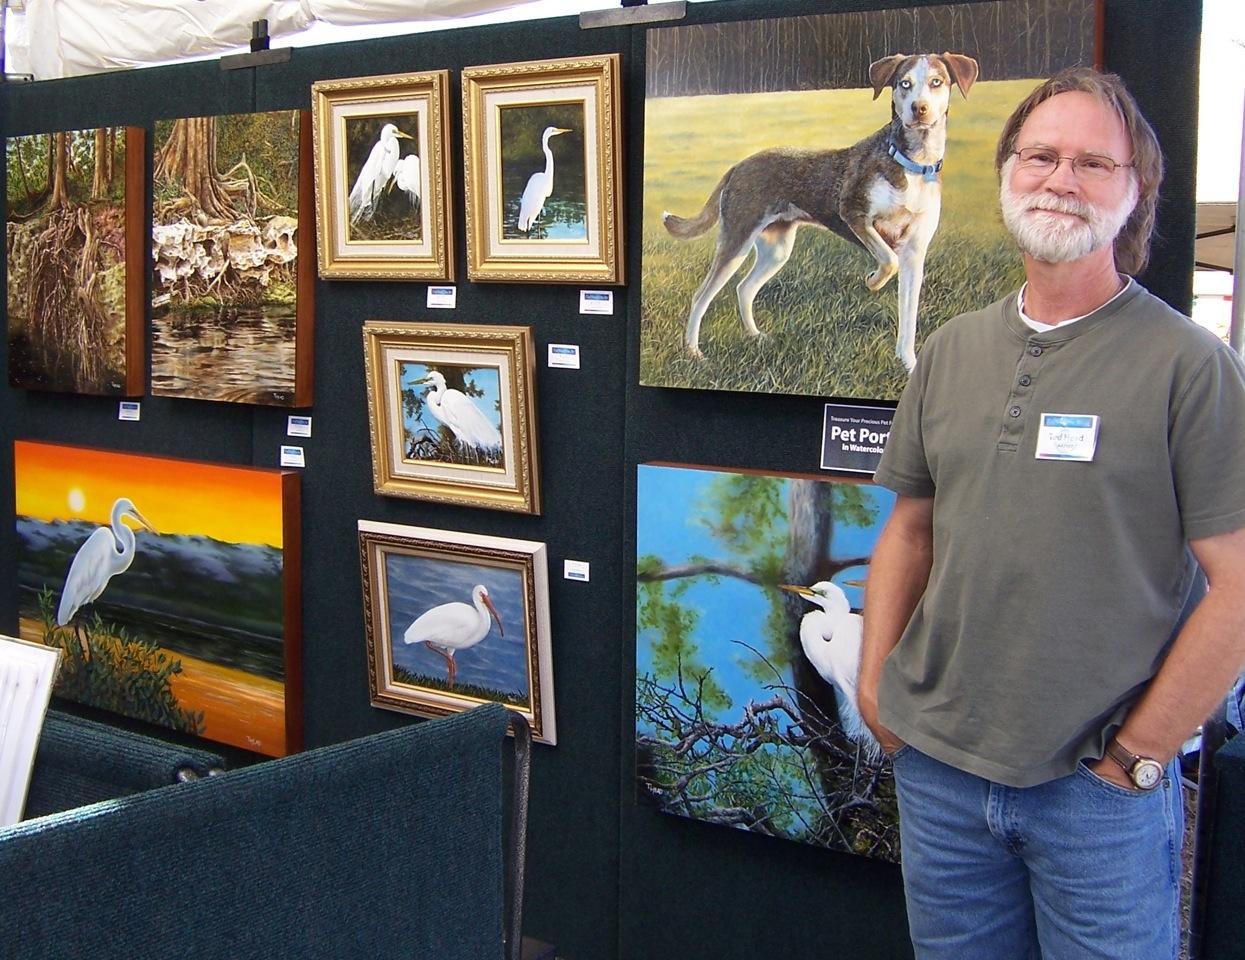 Nov. 29-30: 49th Annual St. Augustine Arts & Craft Festival